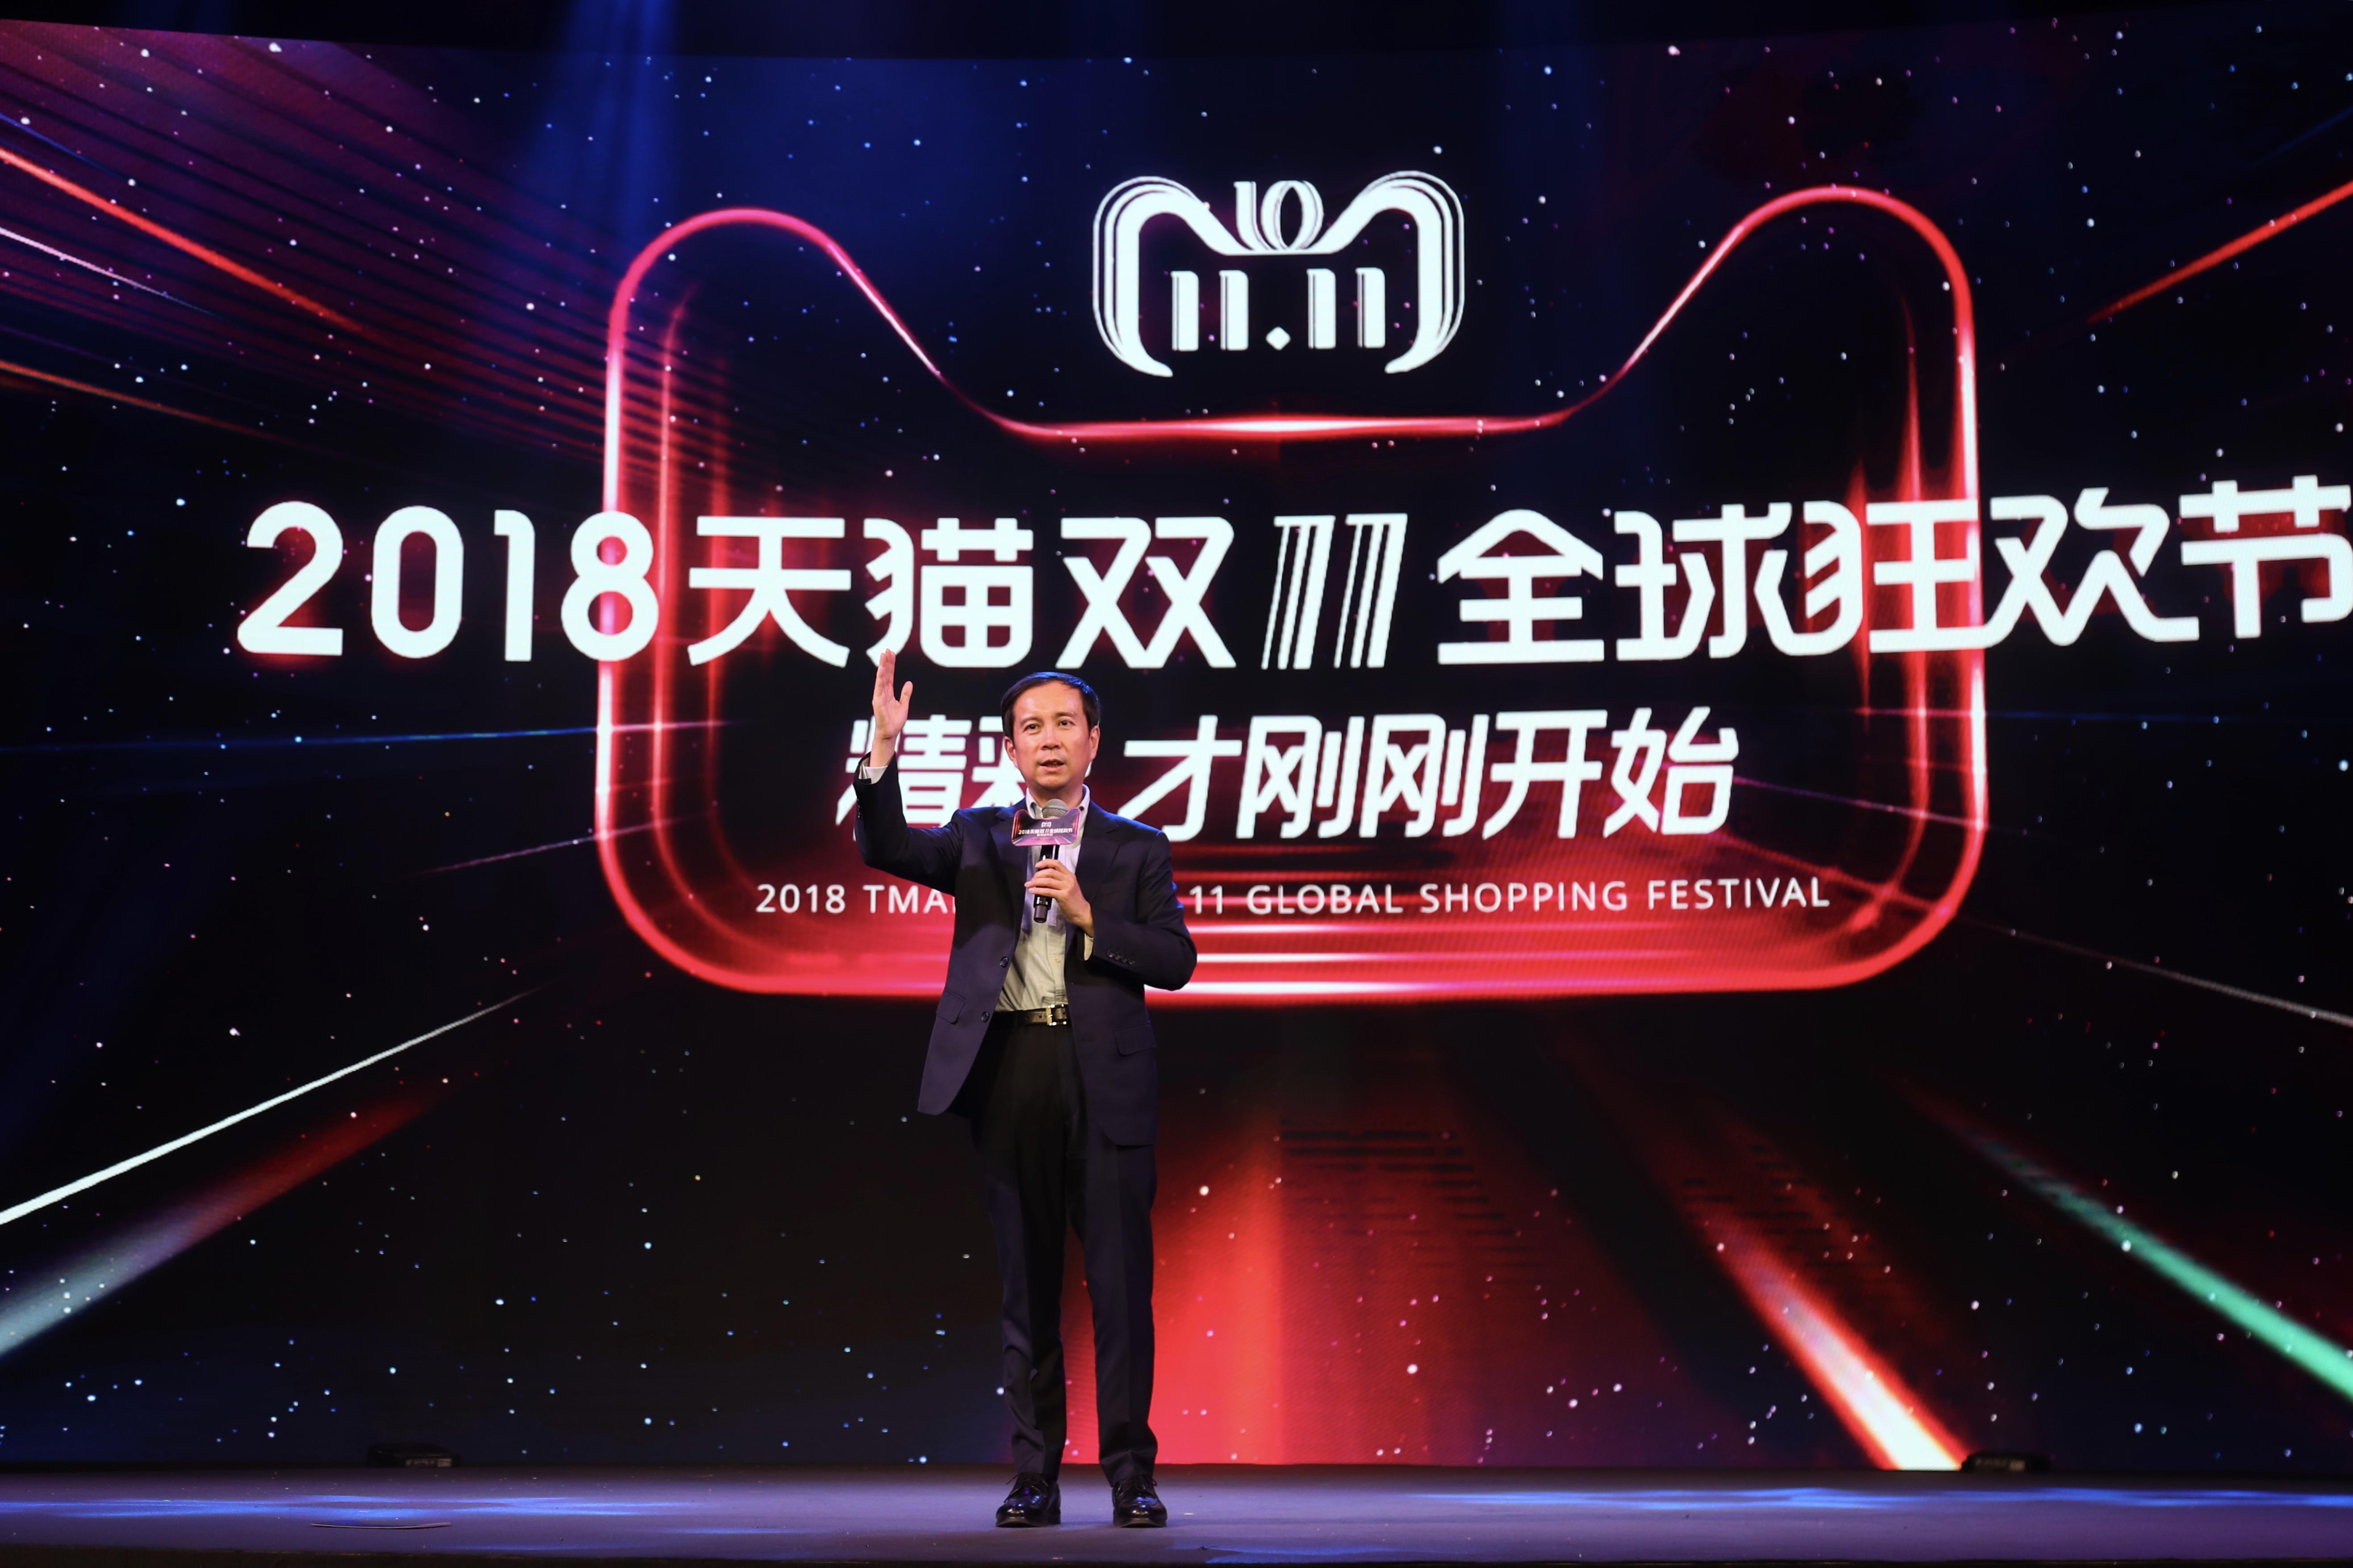 Alibaba Group Luncurkan Acara 11.11 Global Shopping Festival 2018